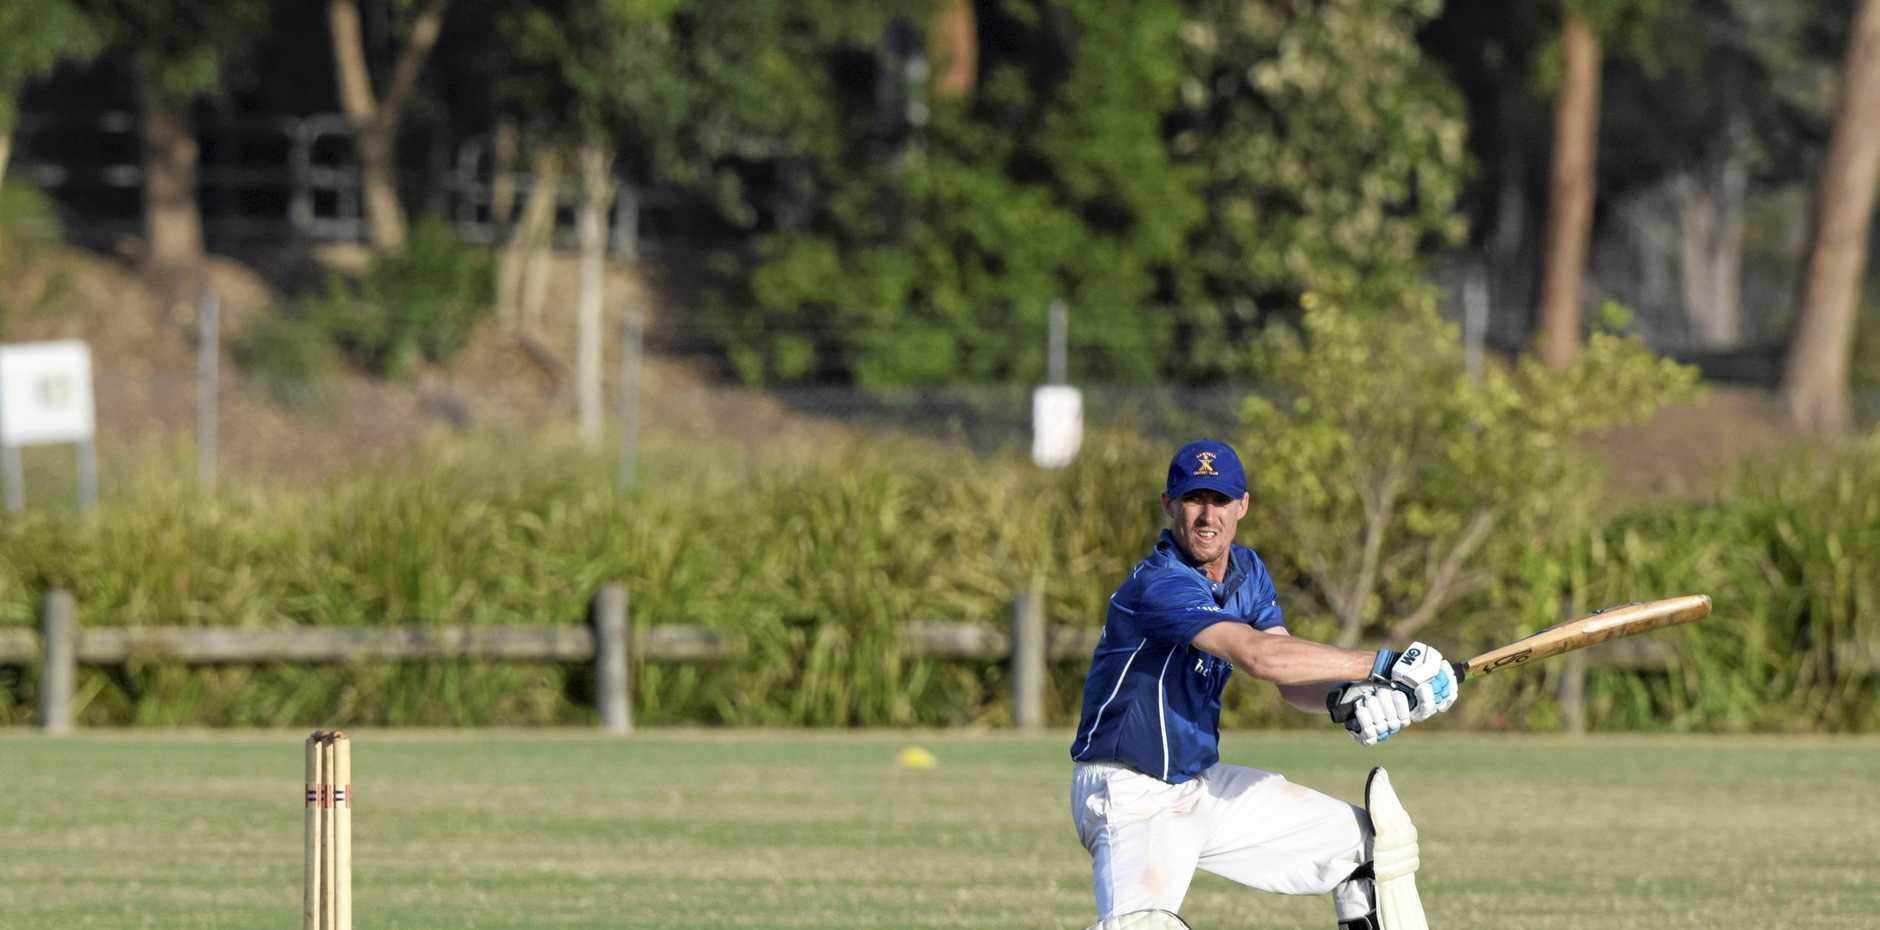 Sawtell batsman Mathew Riddoch blasts over the infield during the CHDCA Twenty20 final played against the Coffs Colts.